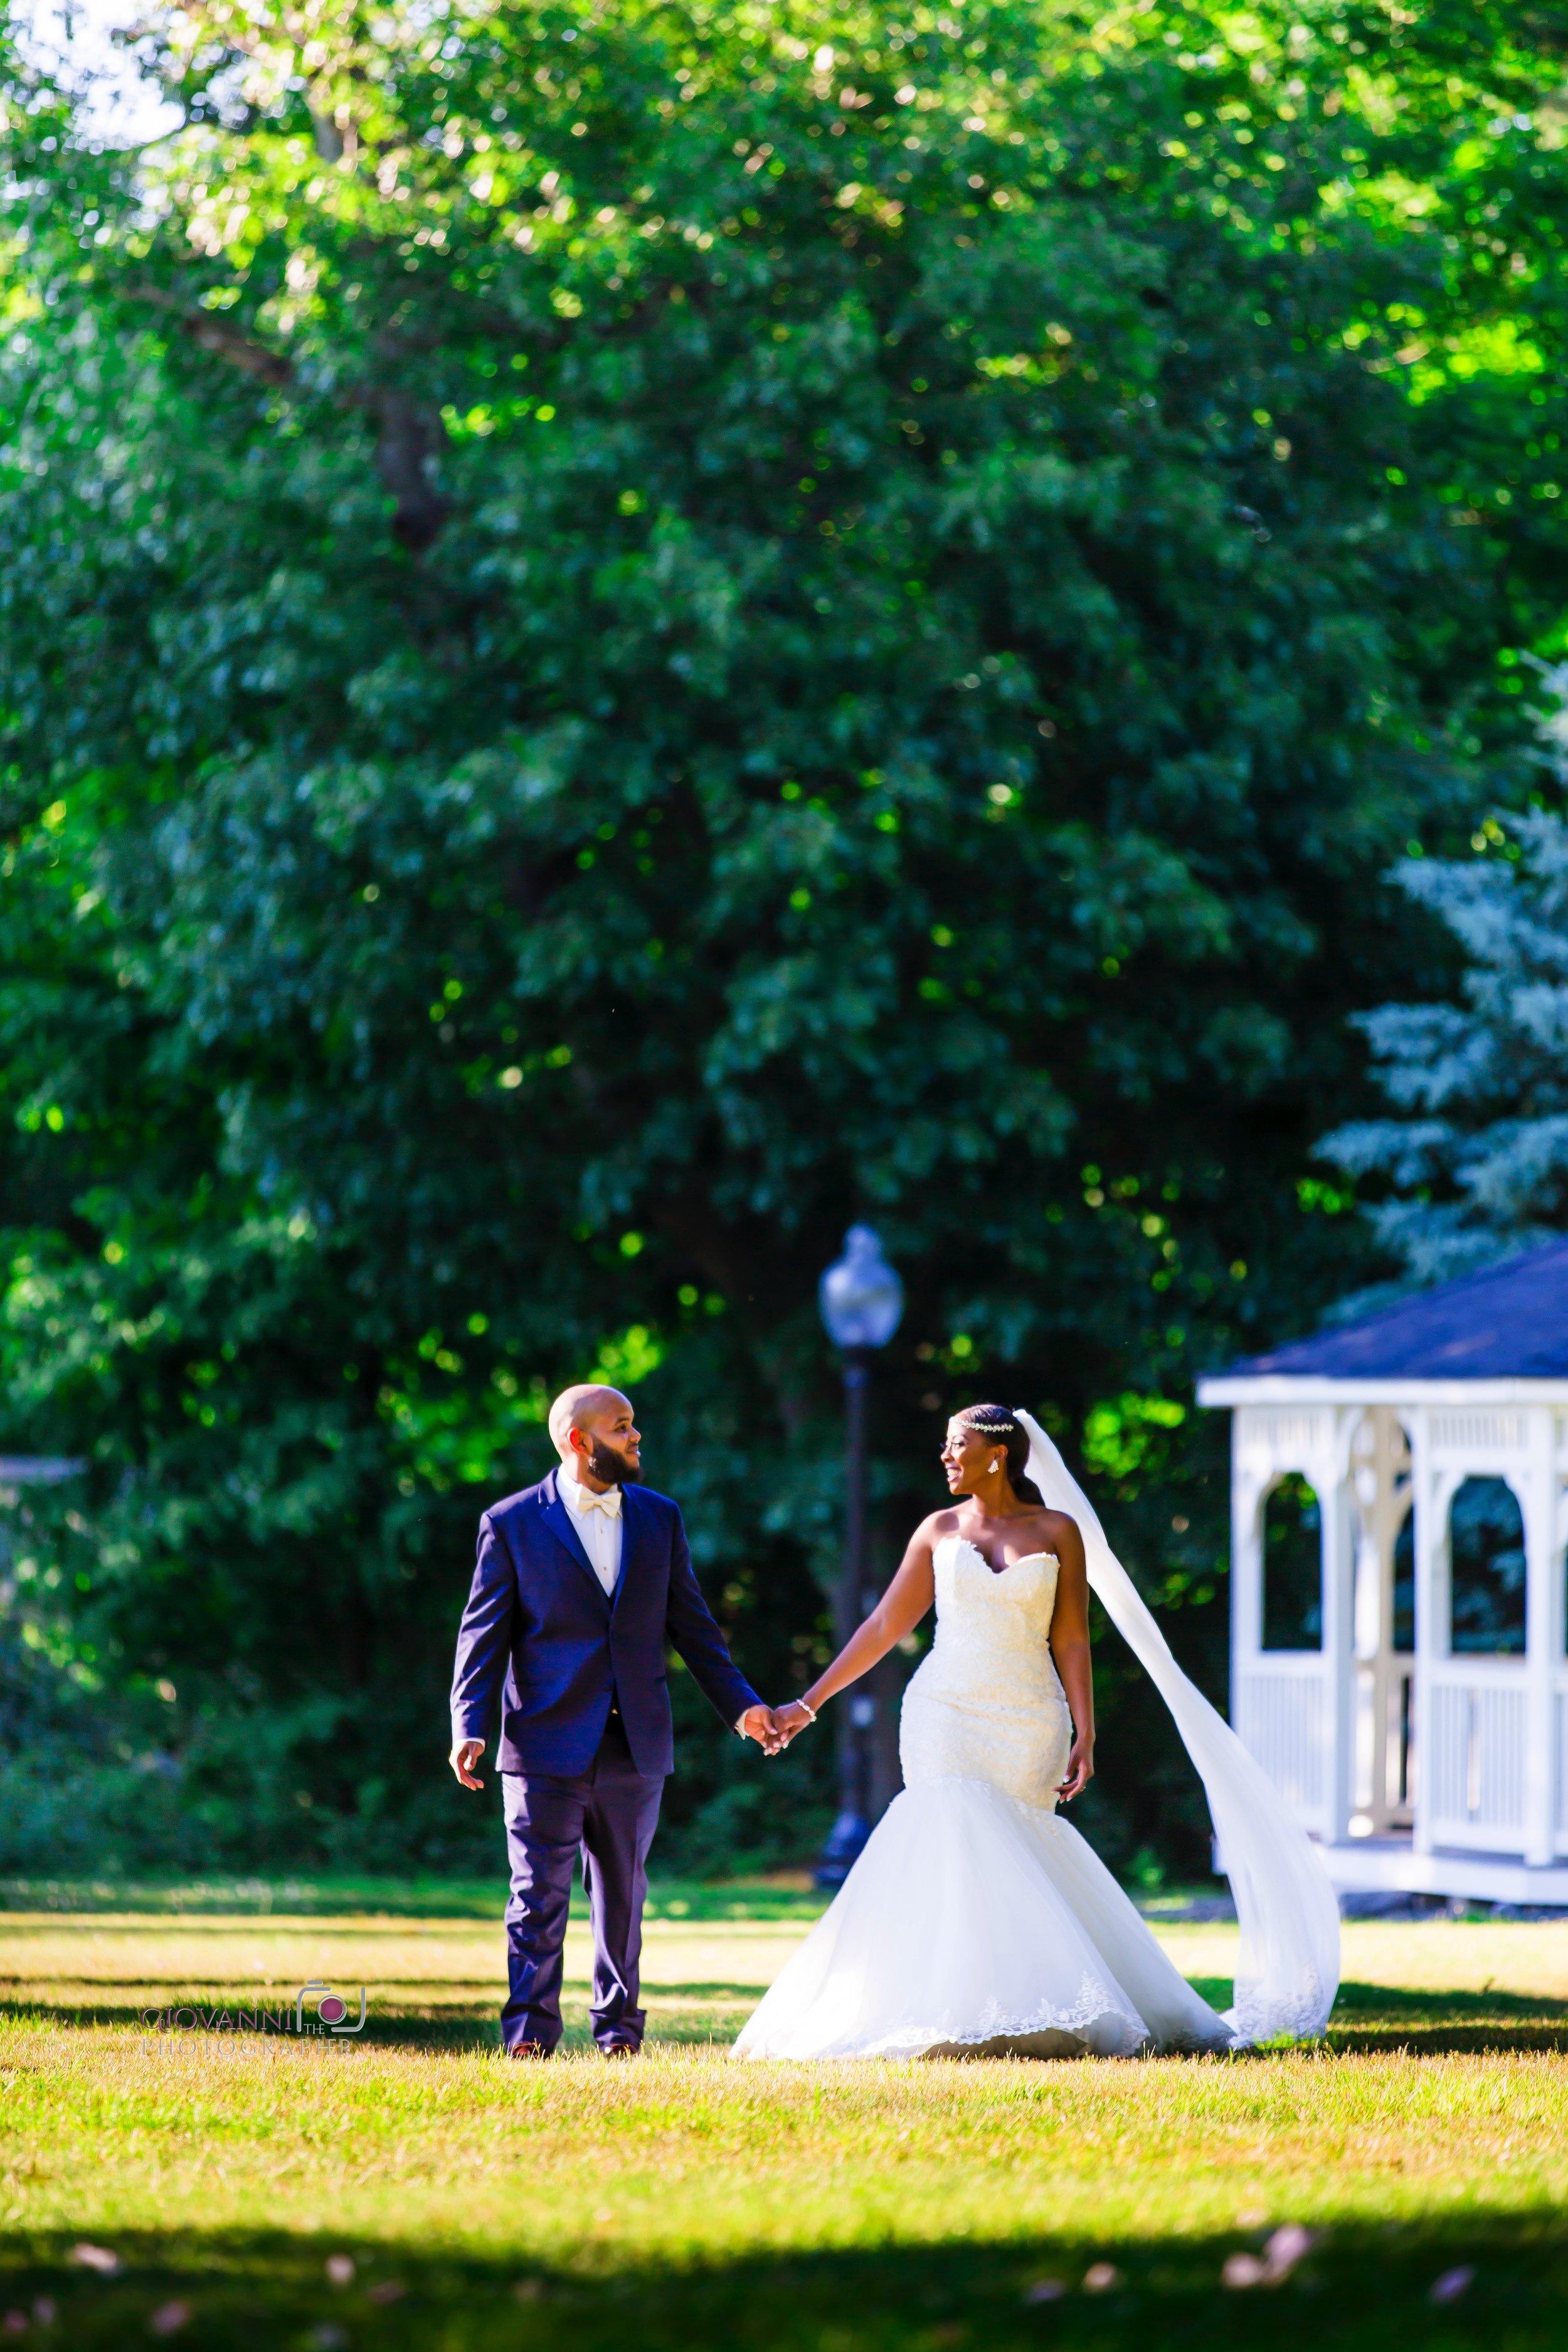 314A0895-Giovanni The Photographer-Best Boston Wedding Photography-Randolph Elks 2130 WM50.jpg